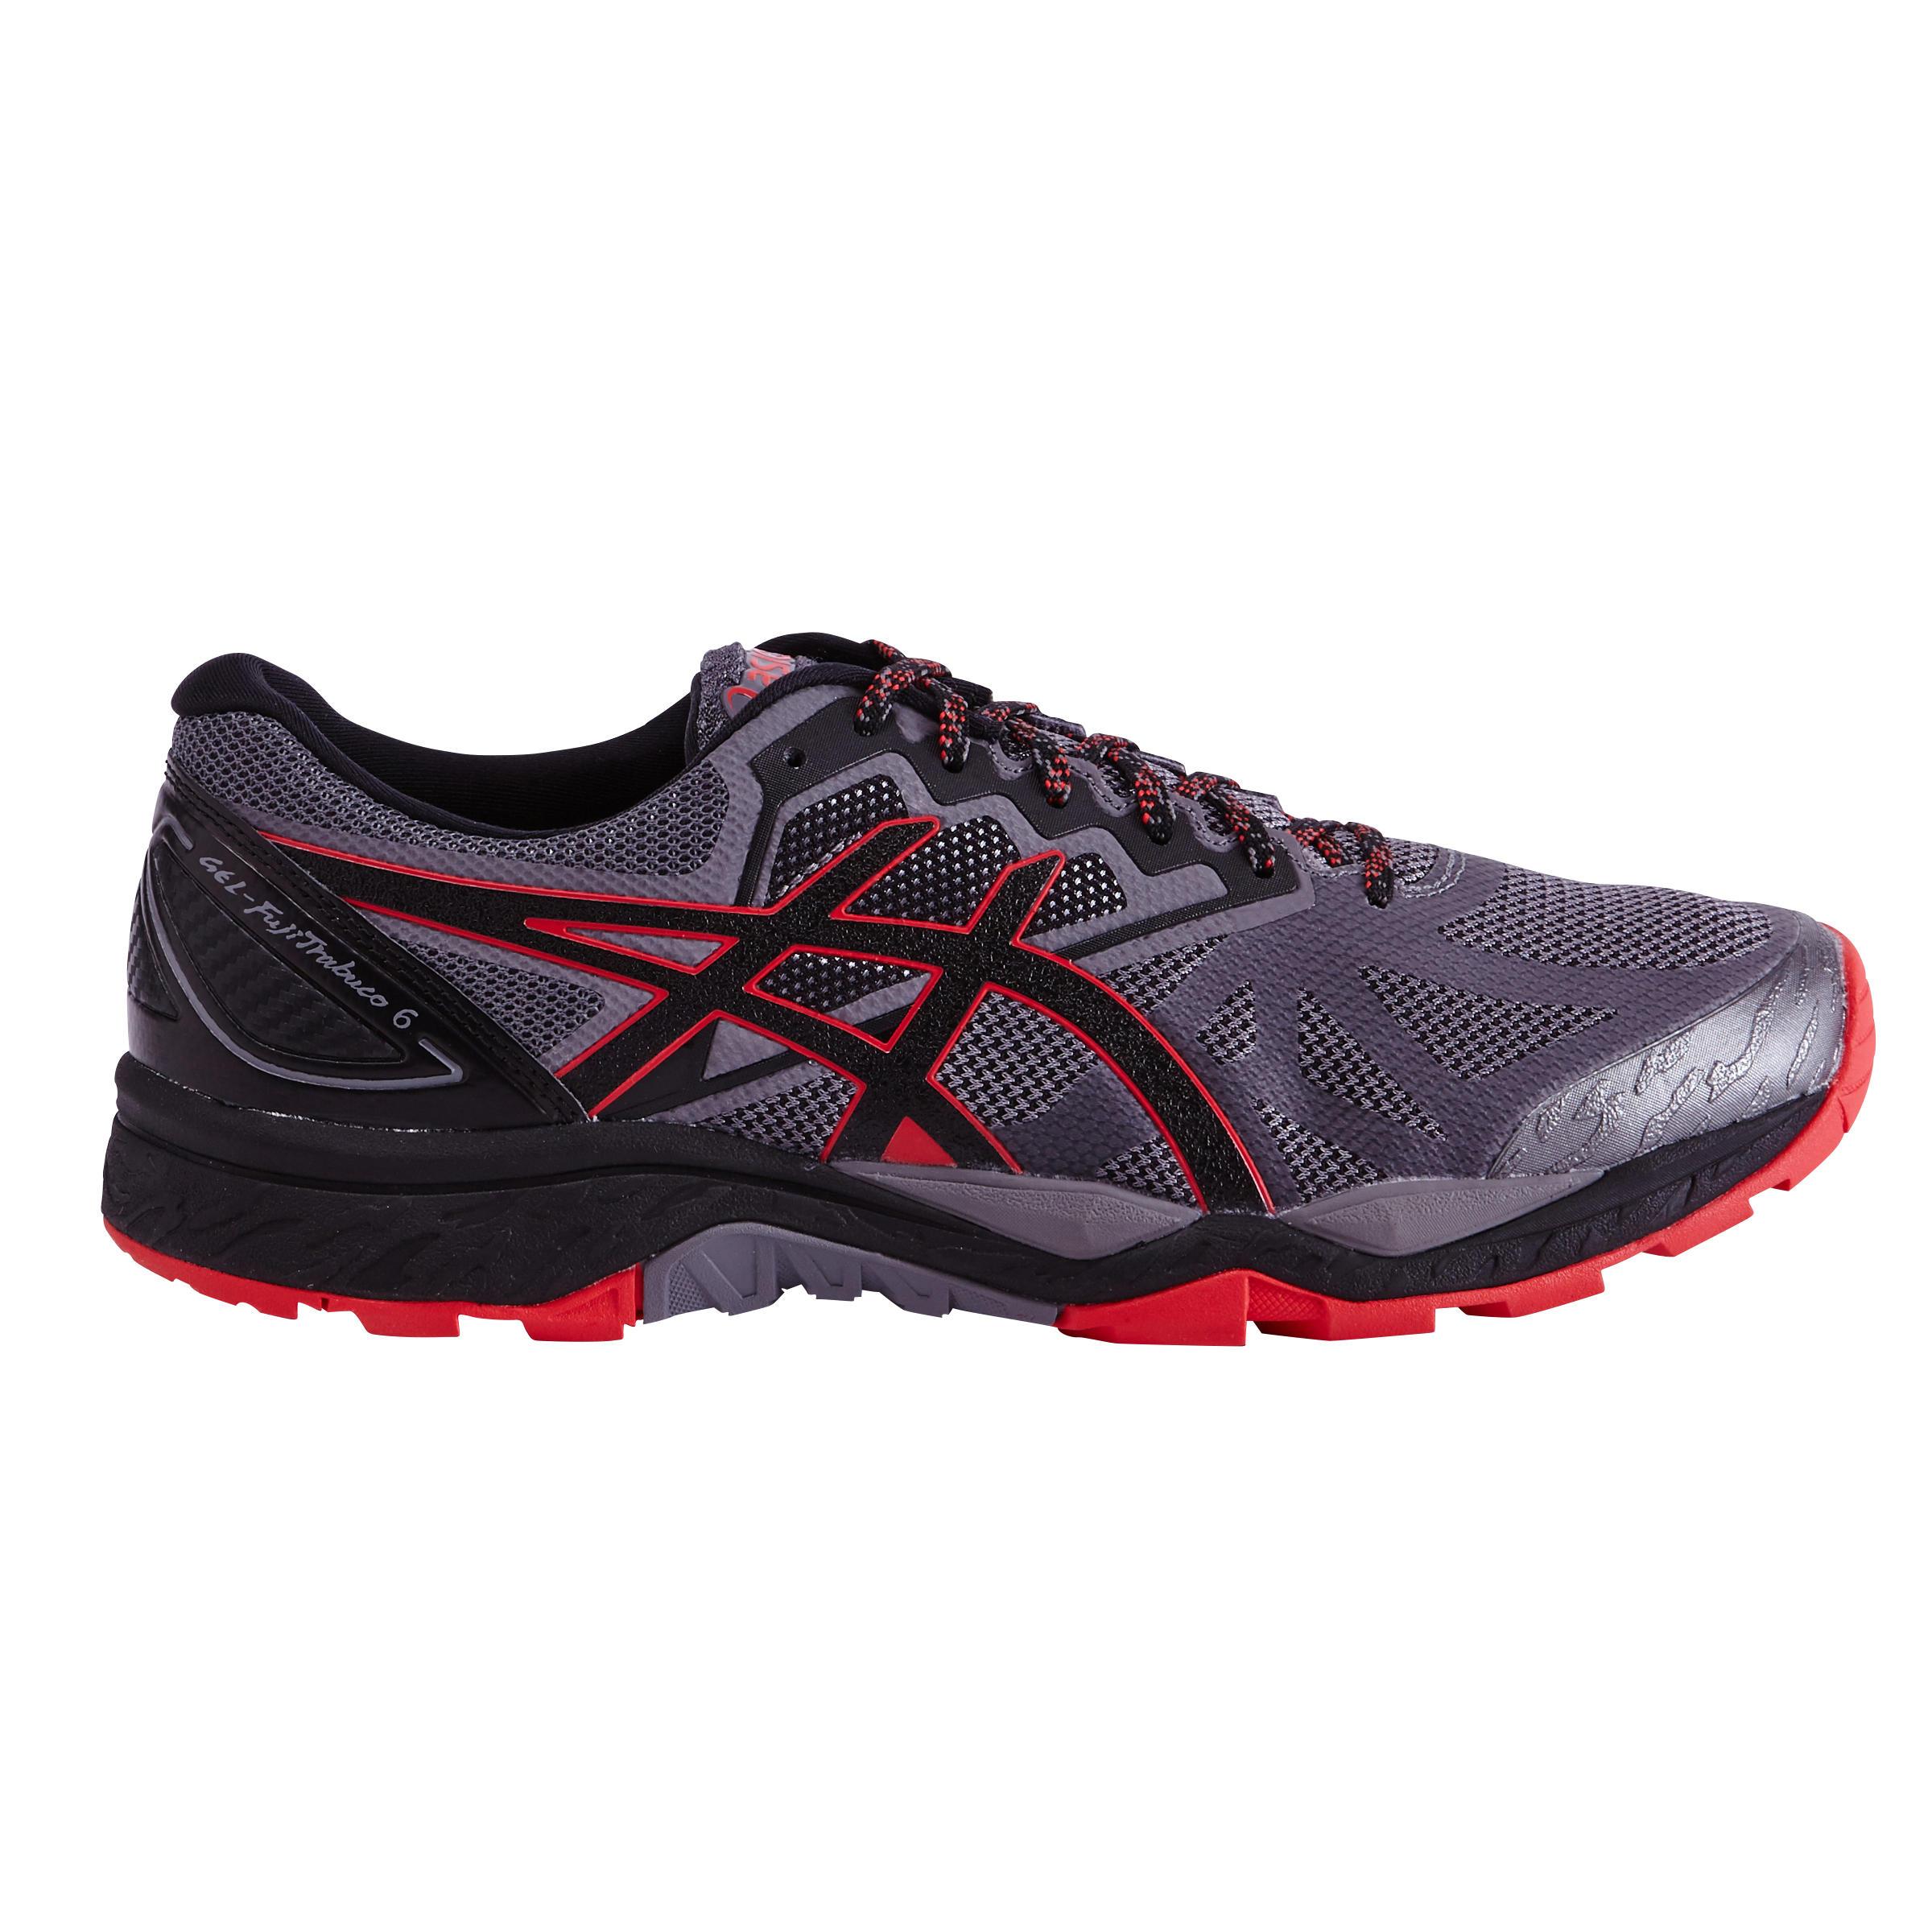 premium selection 06542 adcd7 Trail Decathlon Bleu Asics Chaussures Homme 6 Gel Fujitrabuco pqg0w